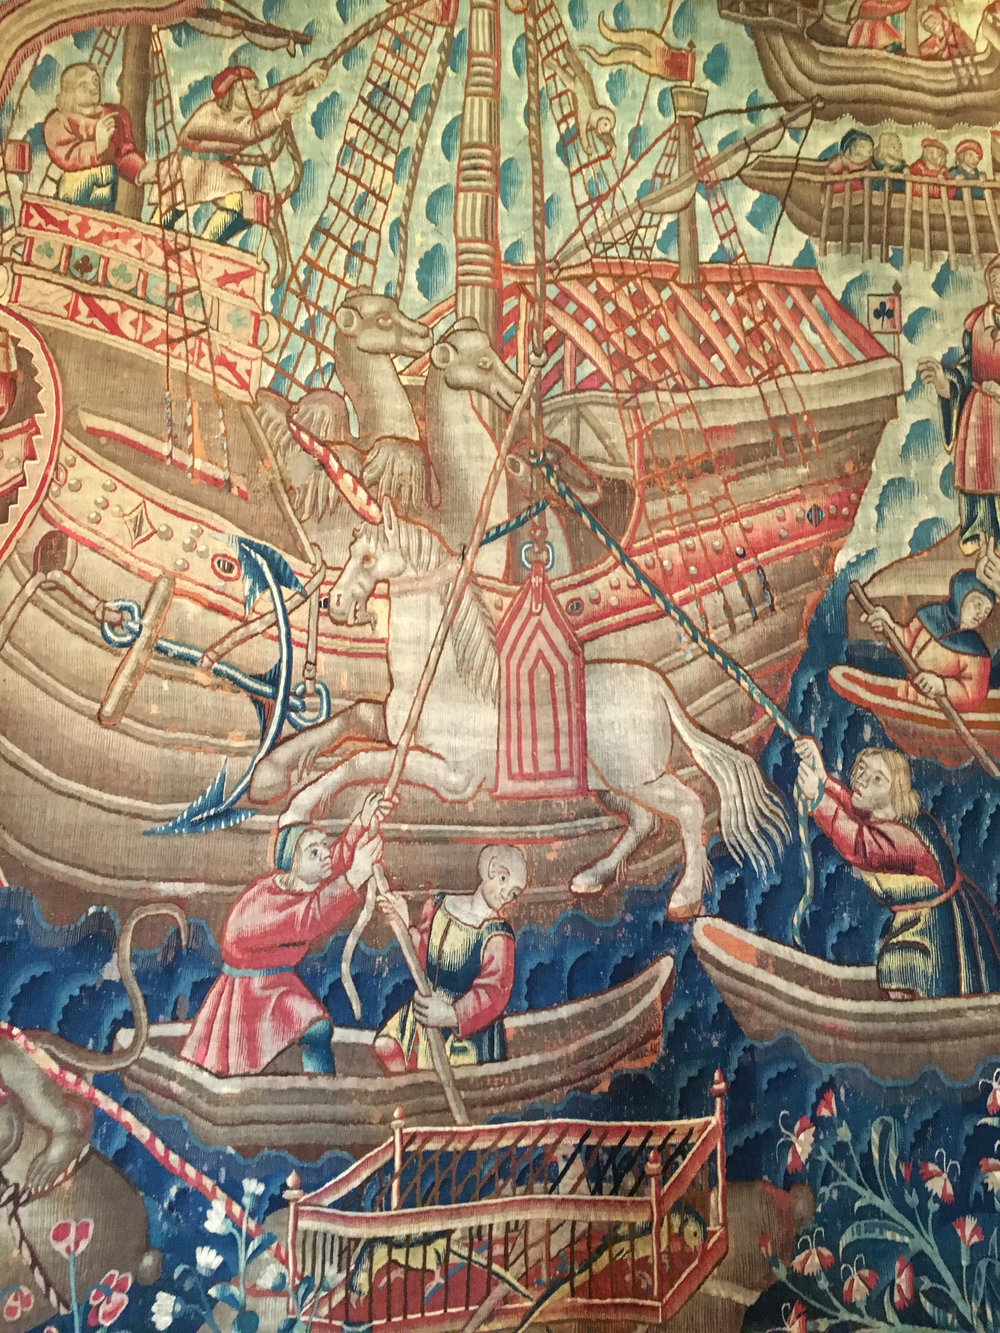 Detail, The Discovery of India, tapestry, Tournai, 1504-30, Museu de Arte Antiga, Lisbon. ((Photograph J. Cook)